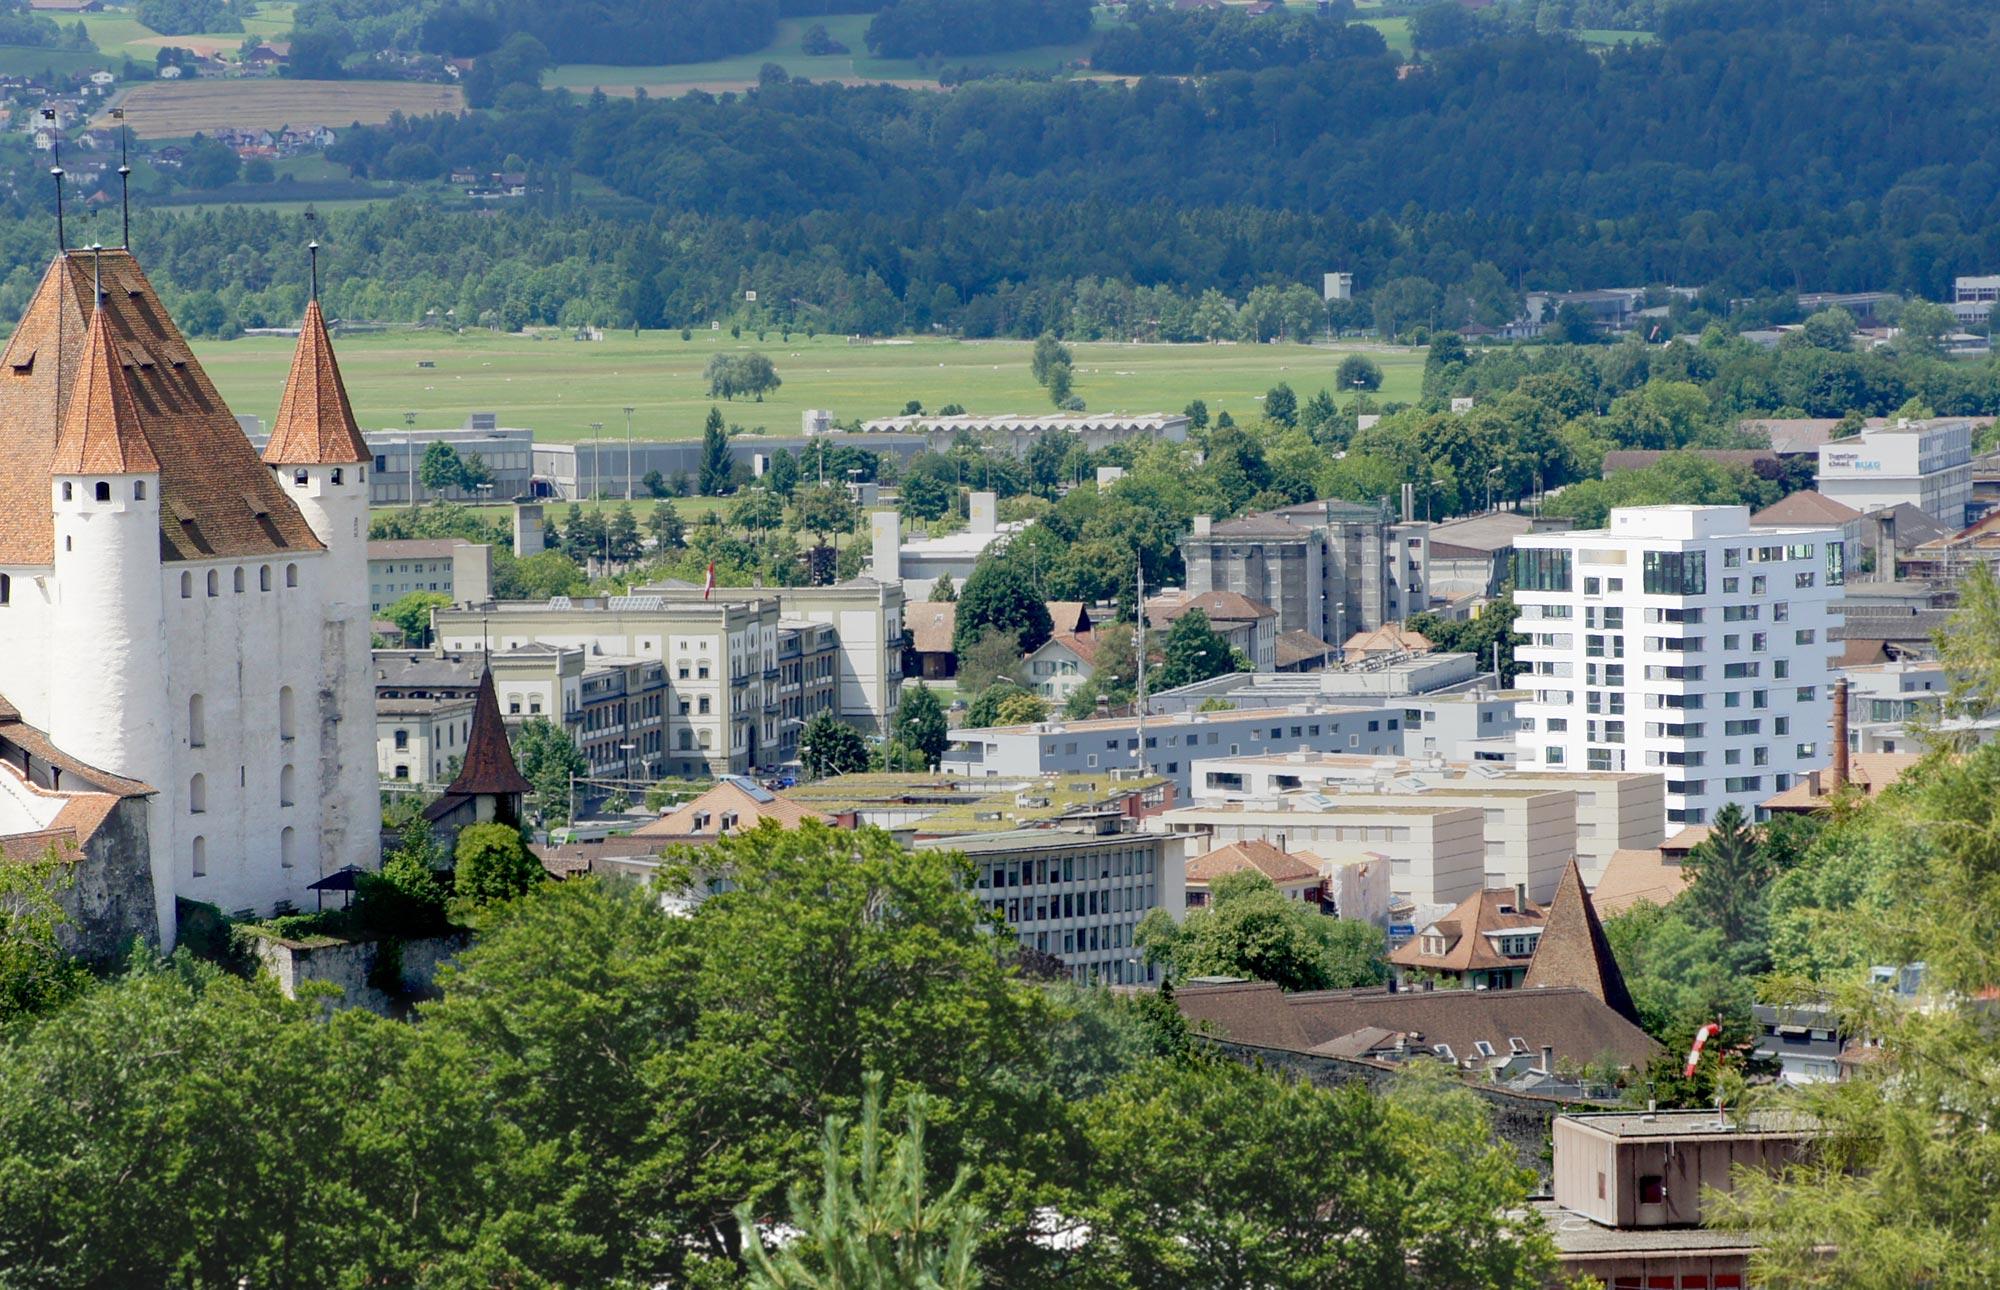 Hochhaus Selve Areal, Thun